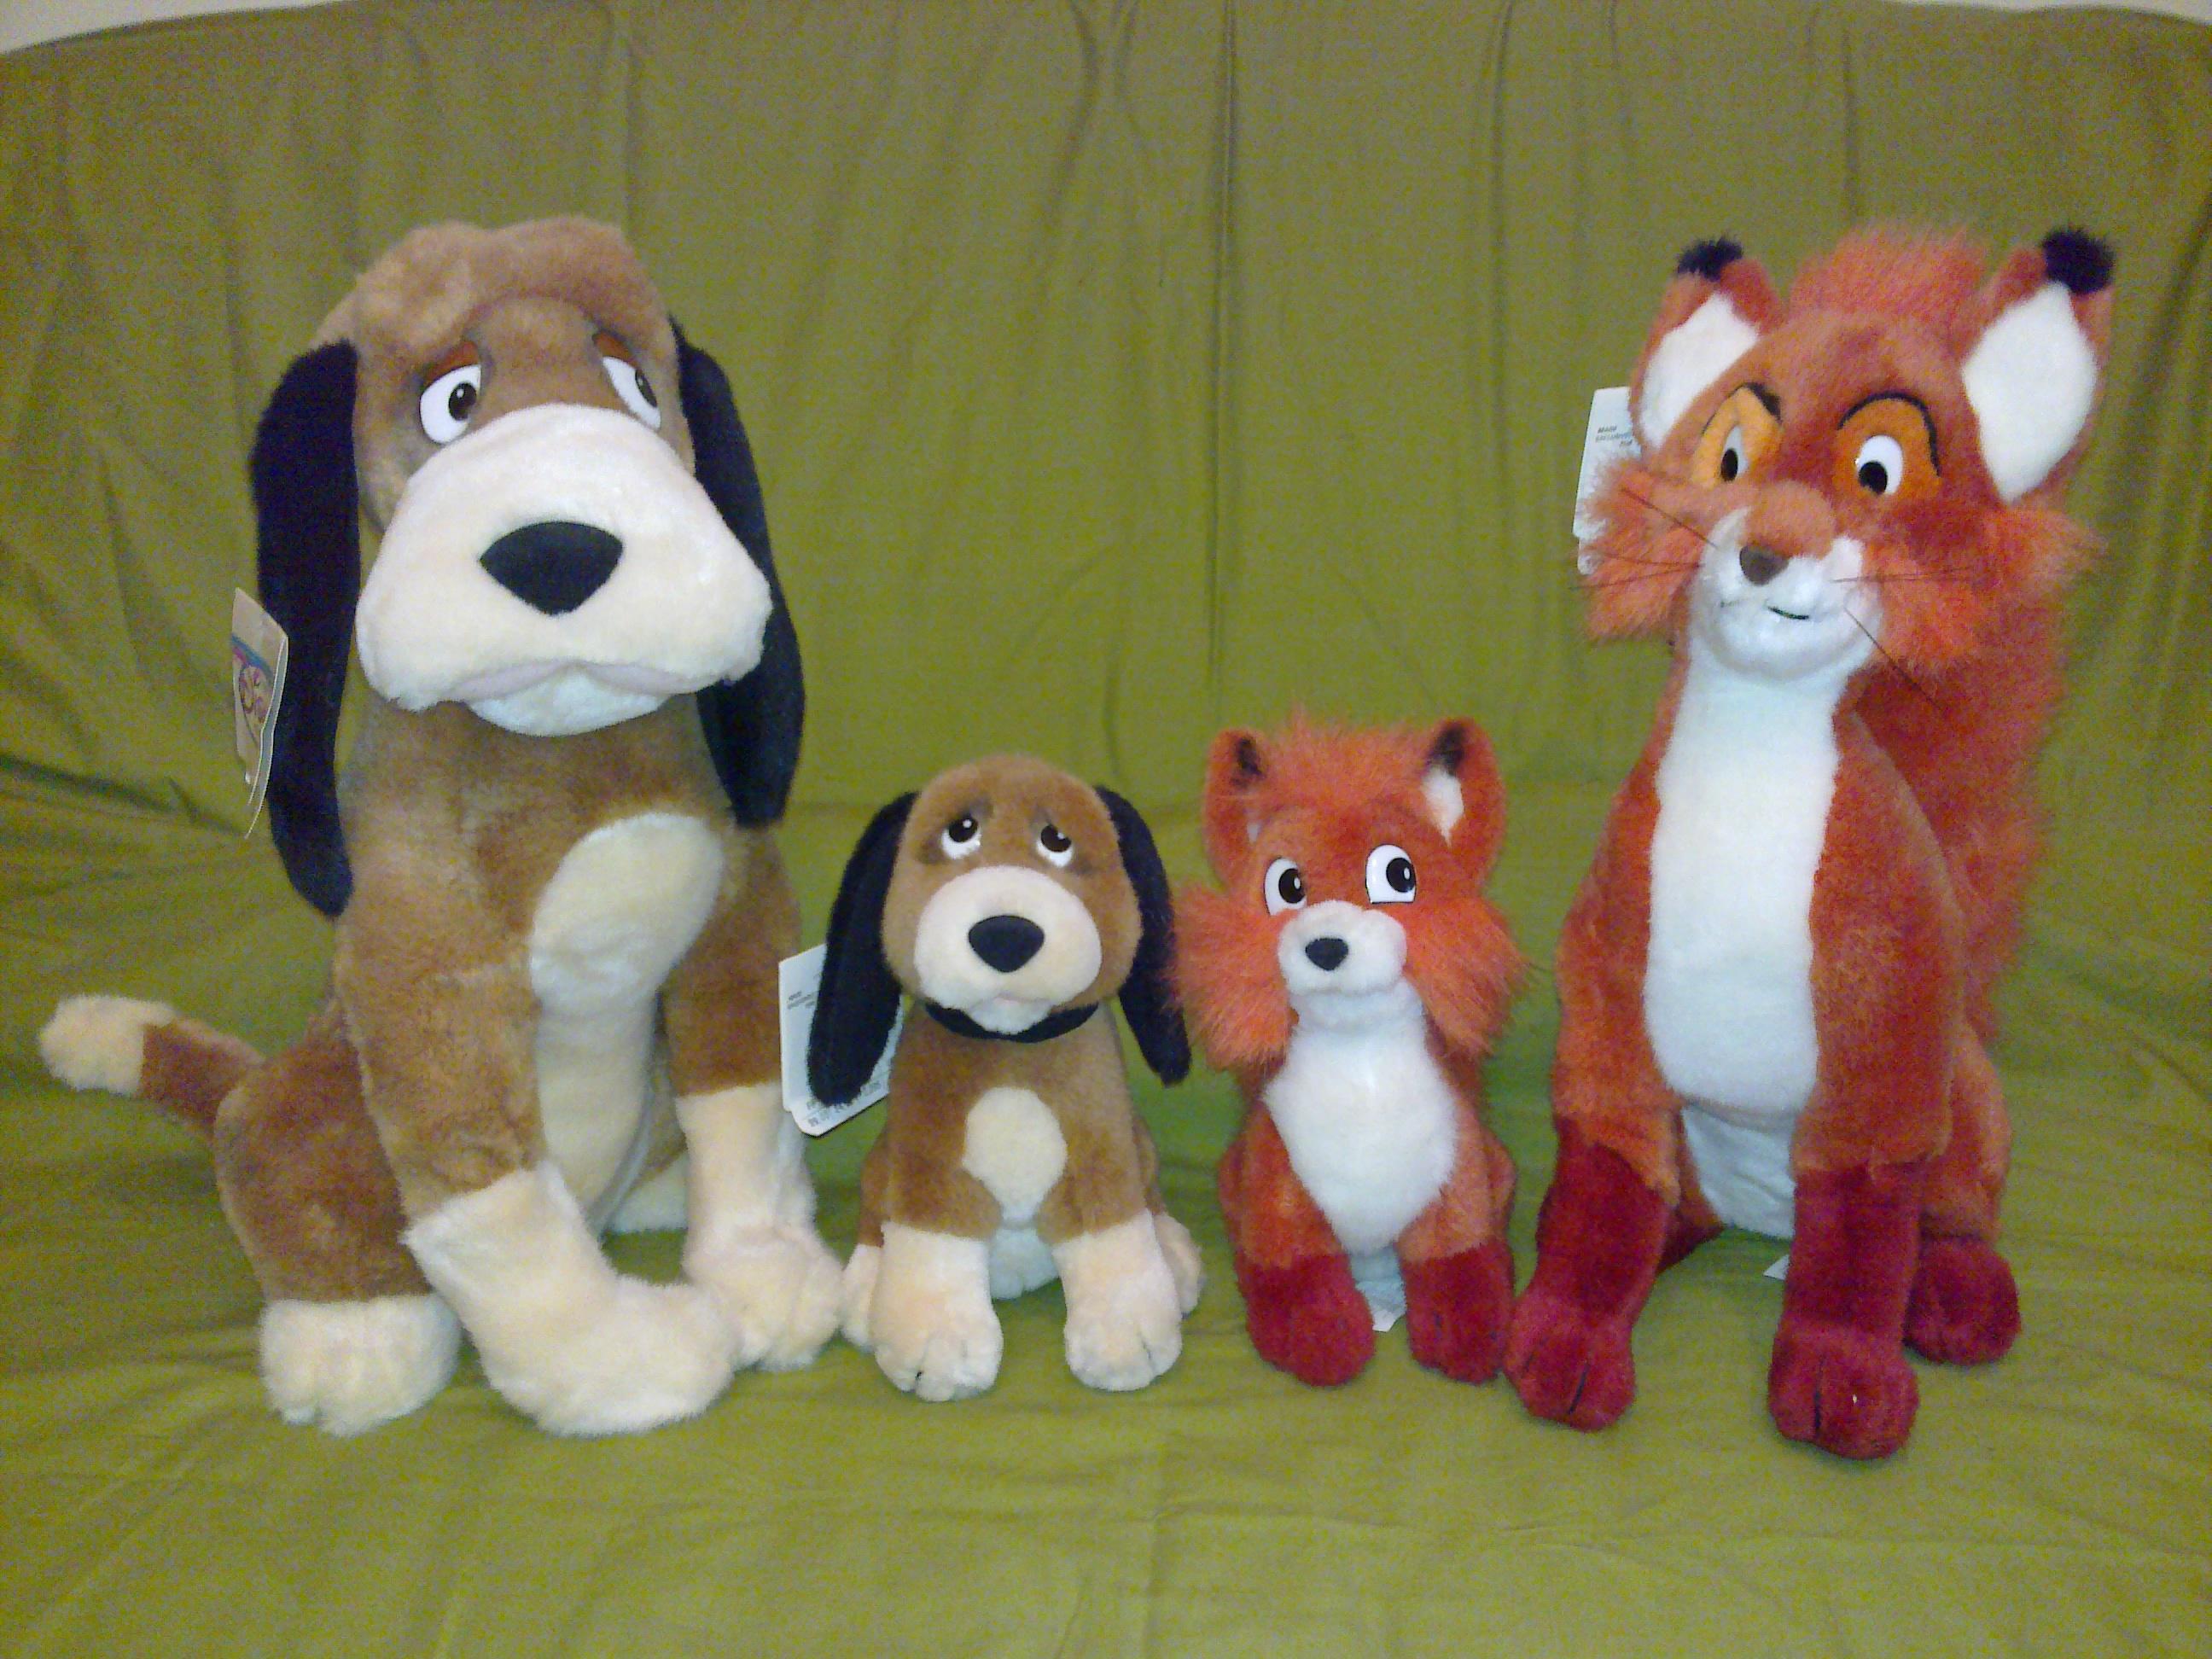 Animal Adventure Toys Dogs